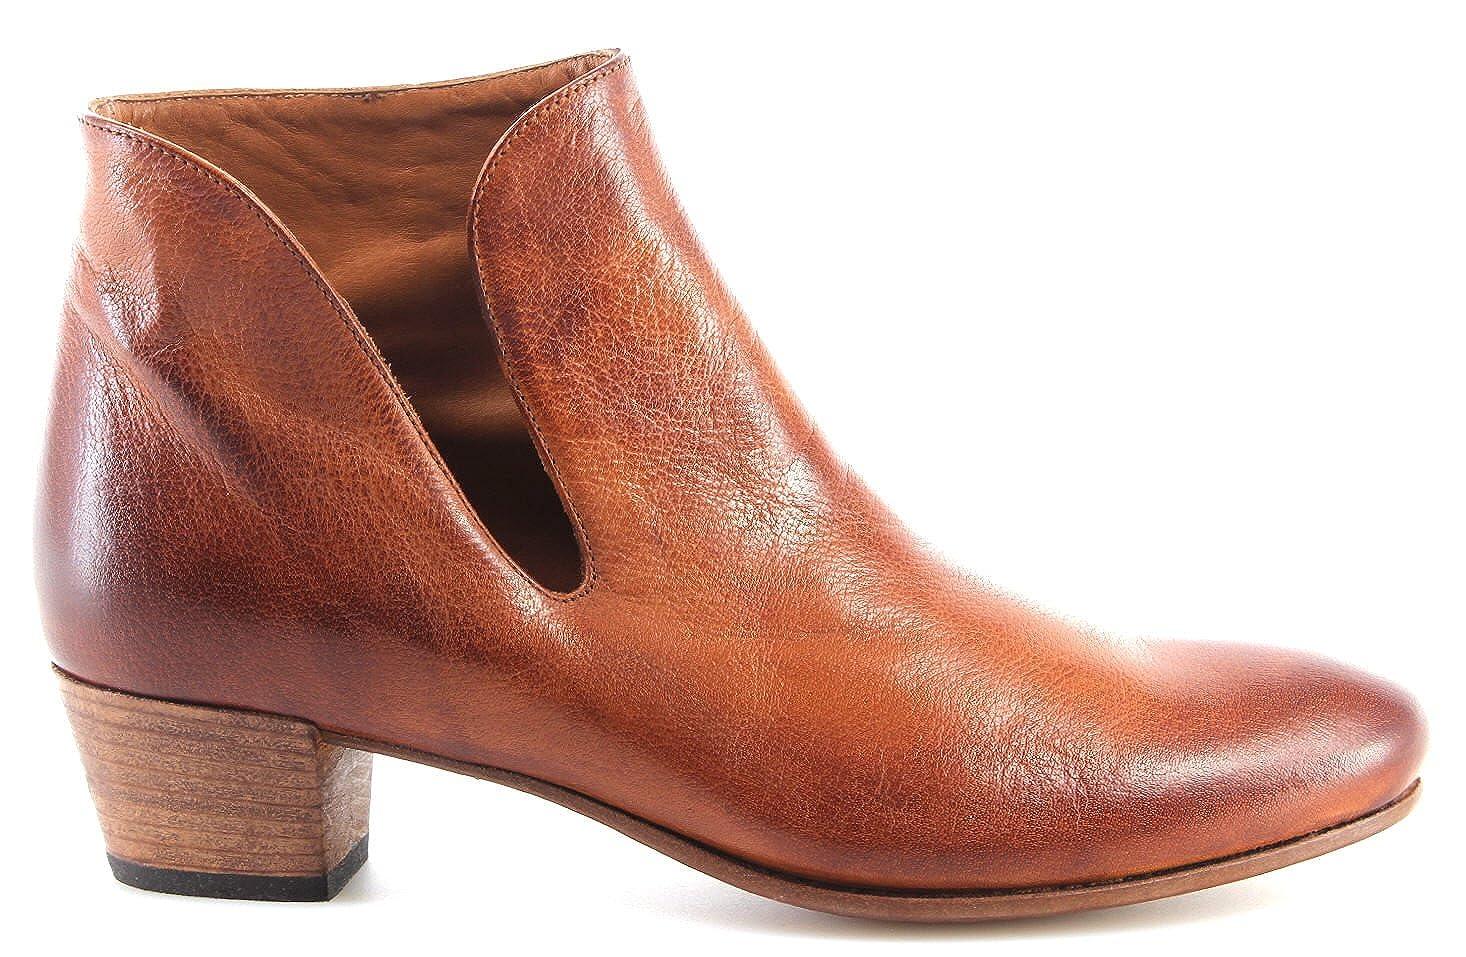 PANTANETTI Chaussures Femmes Bottines Mexico Brandy Turandot Grez  Nouveau